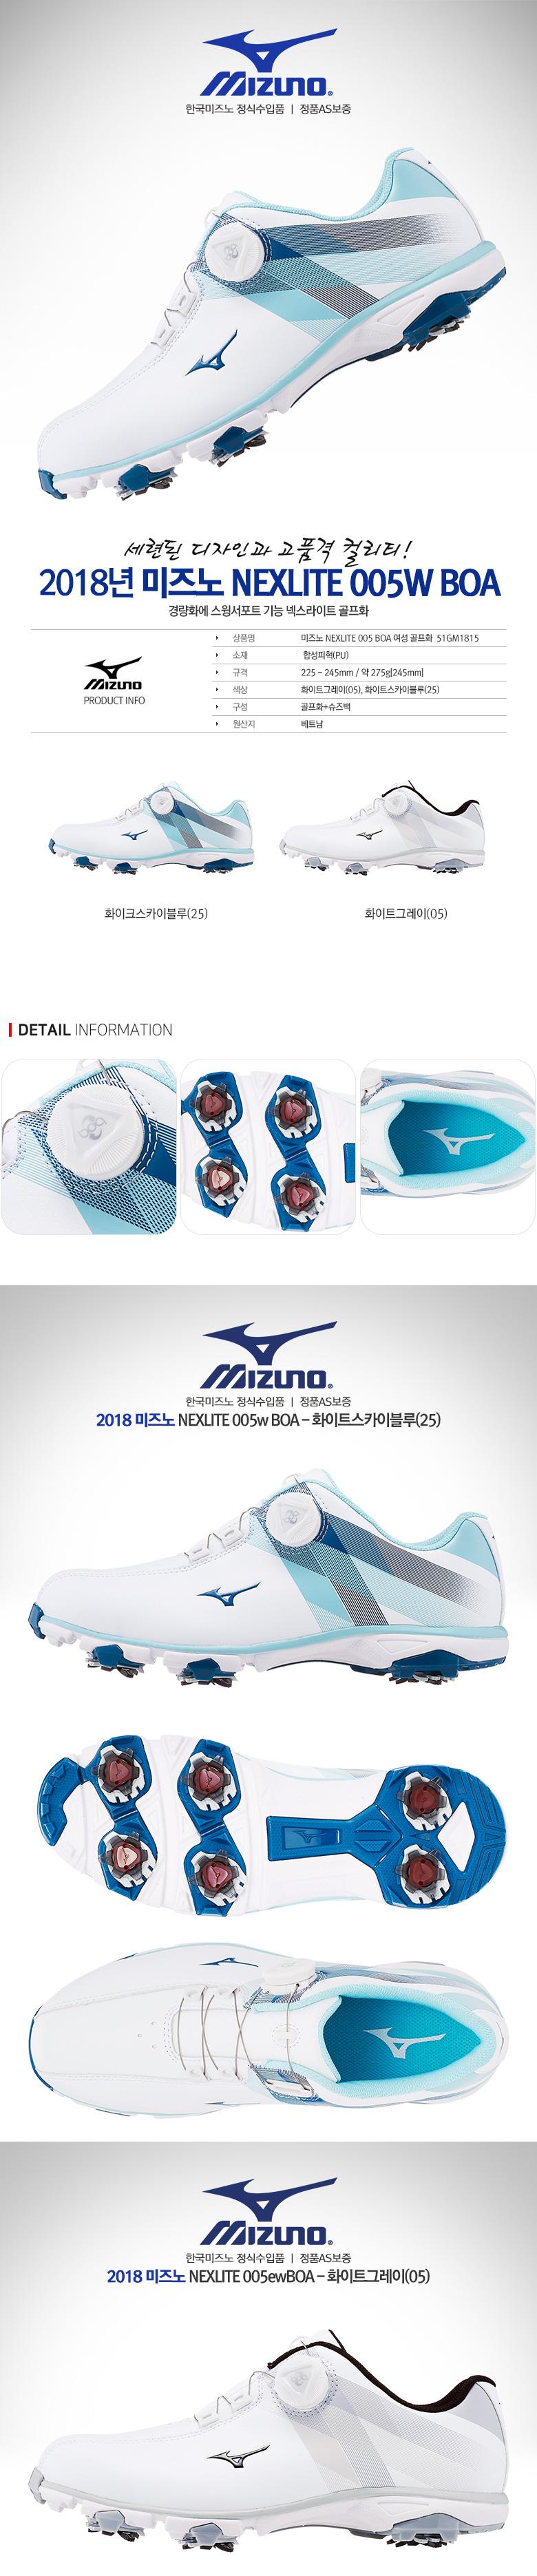 mizuno_nexlite_005w_shoes.jpg